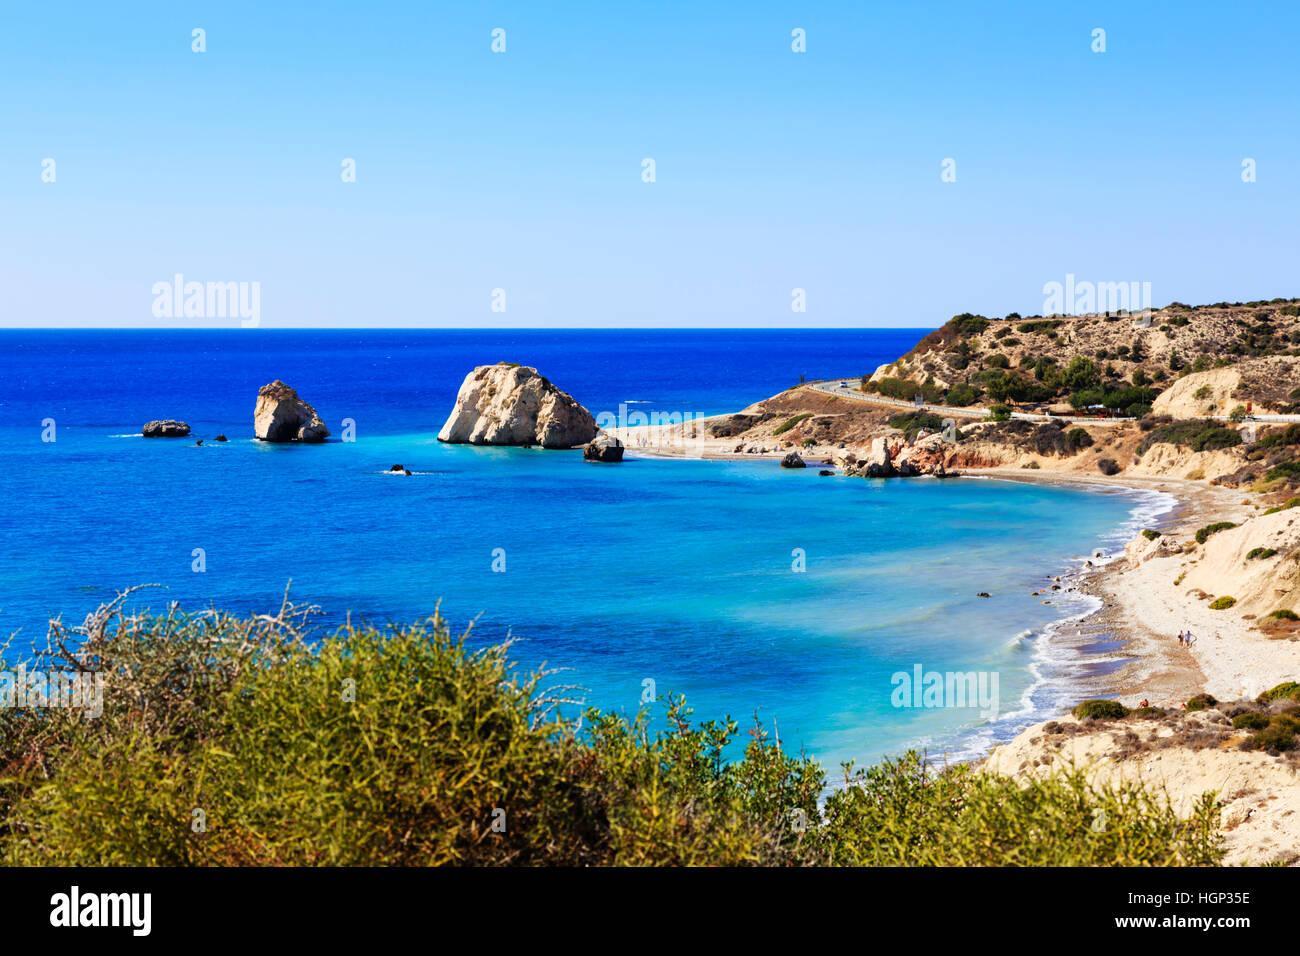 Aphrodite Felsen Petra Tou Romiou, in der Nähe von Paphos, Zypern. Stockbild